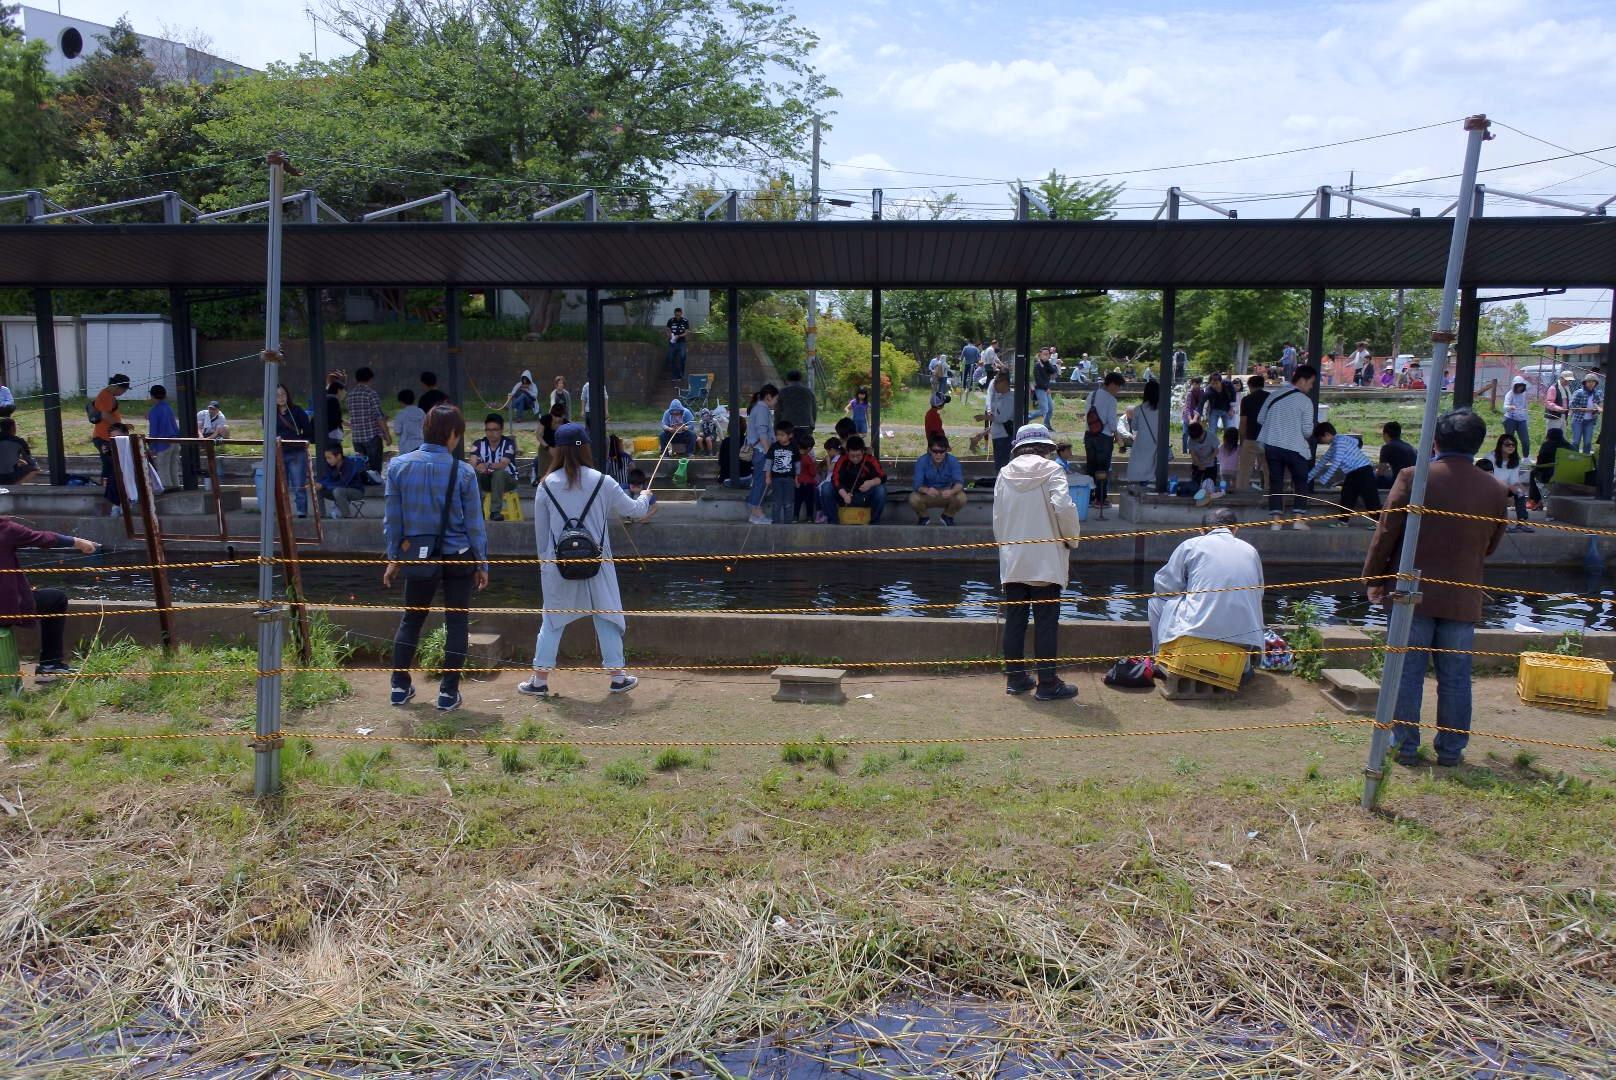 http://ud.t.u-tokyo.ac.jp/news/_images/IMG_9969.JPG